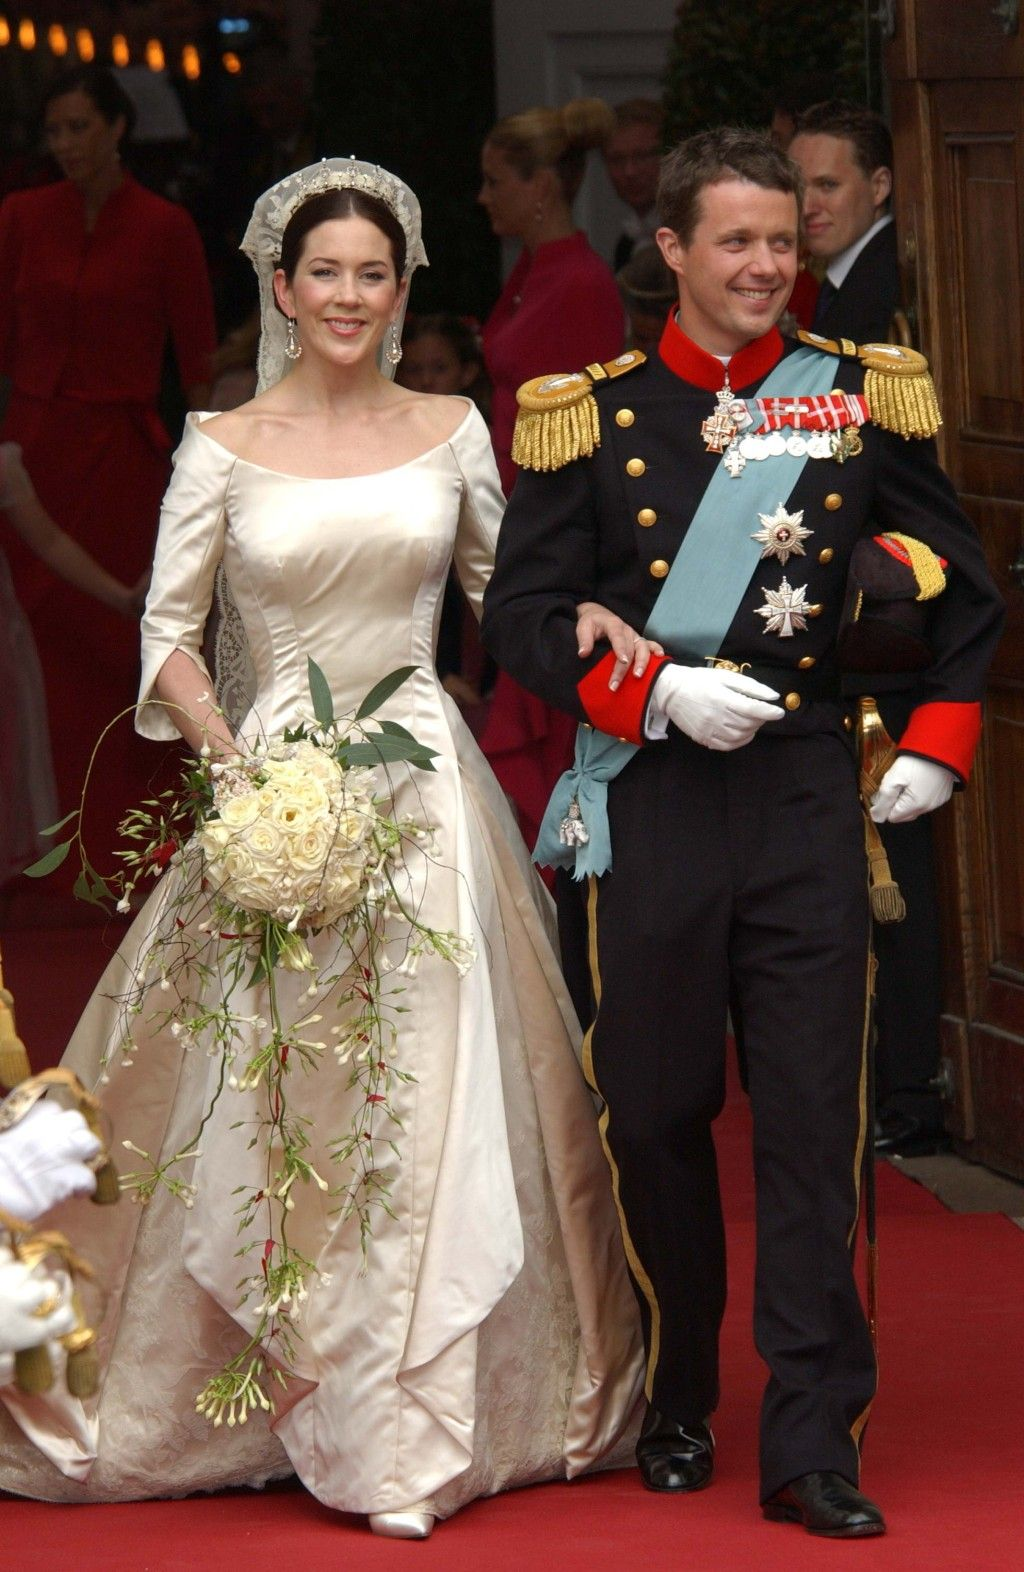 The Wedding Day Crown Princess Mary Prince Frederik Of Denmark